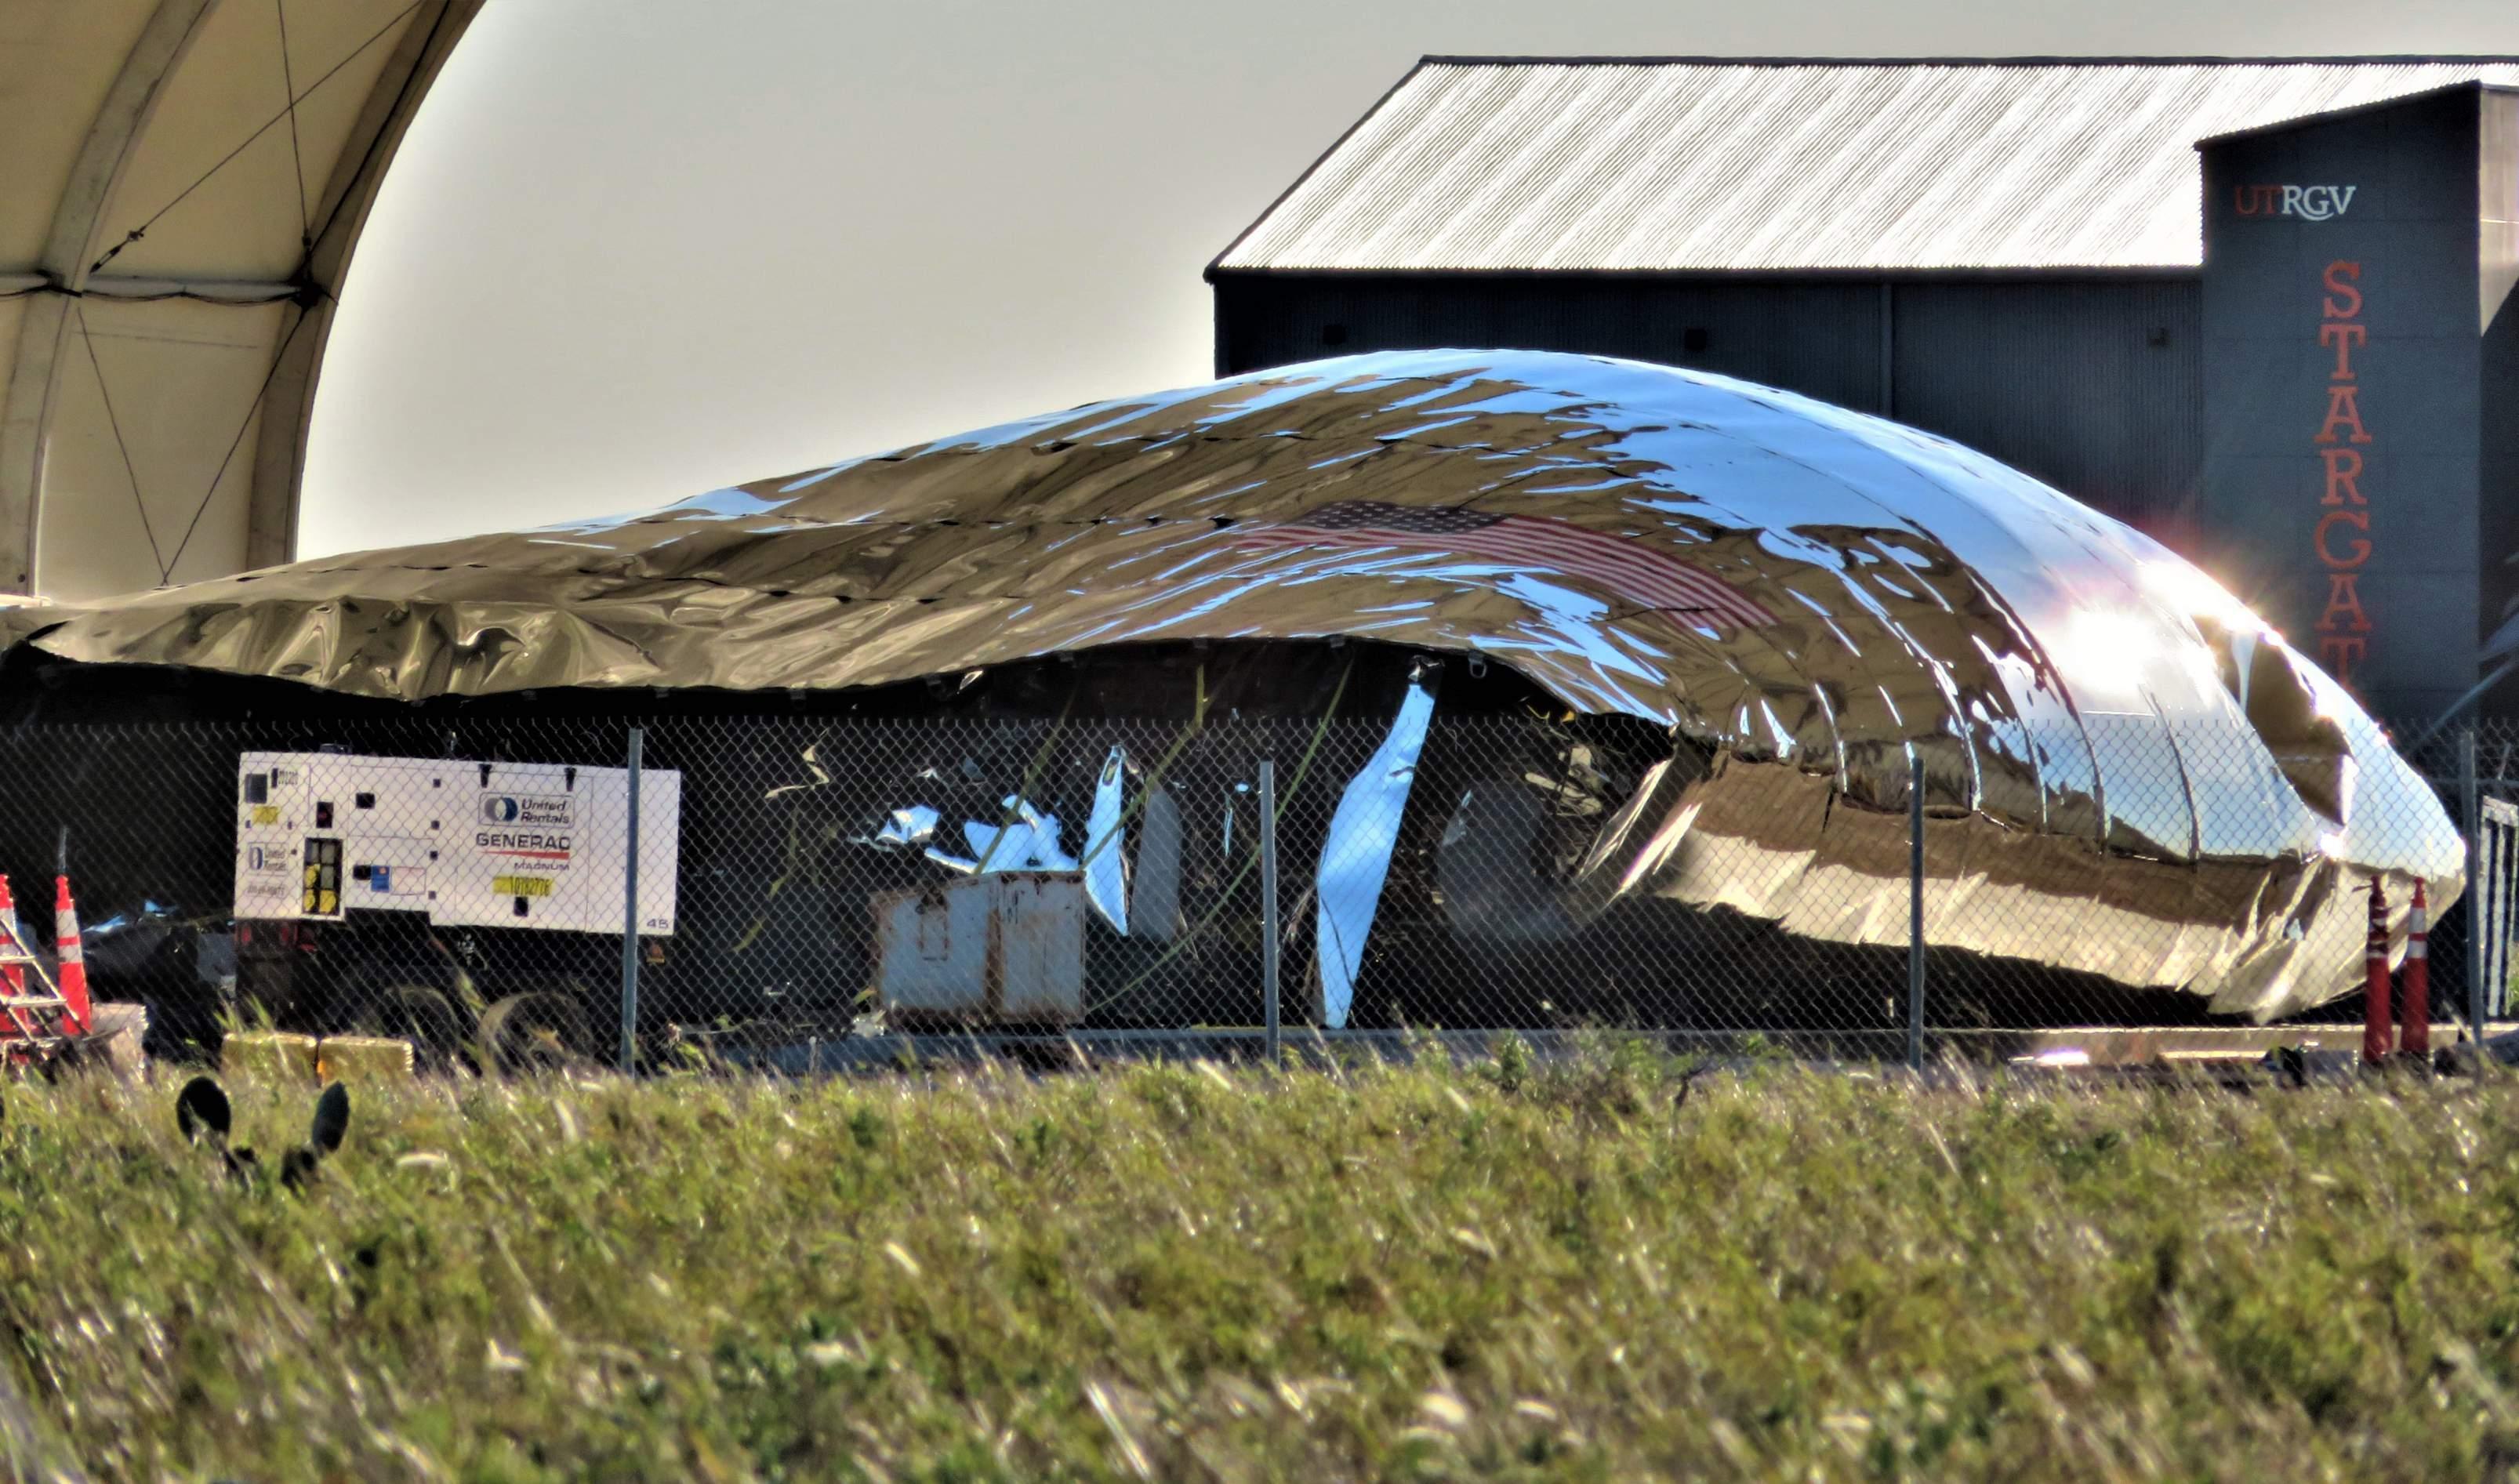 Boca Chica Starship nose collapse 012319 (NASASpaceflight – bocachicagal) 3 edit (c)